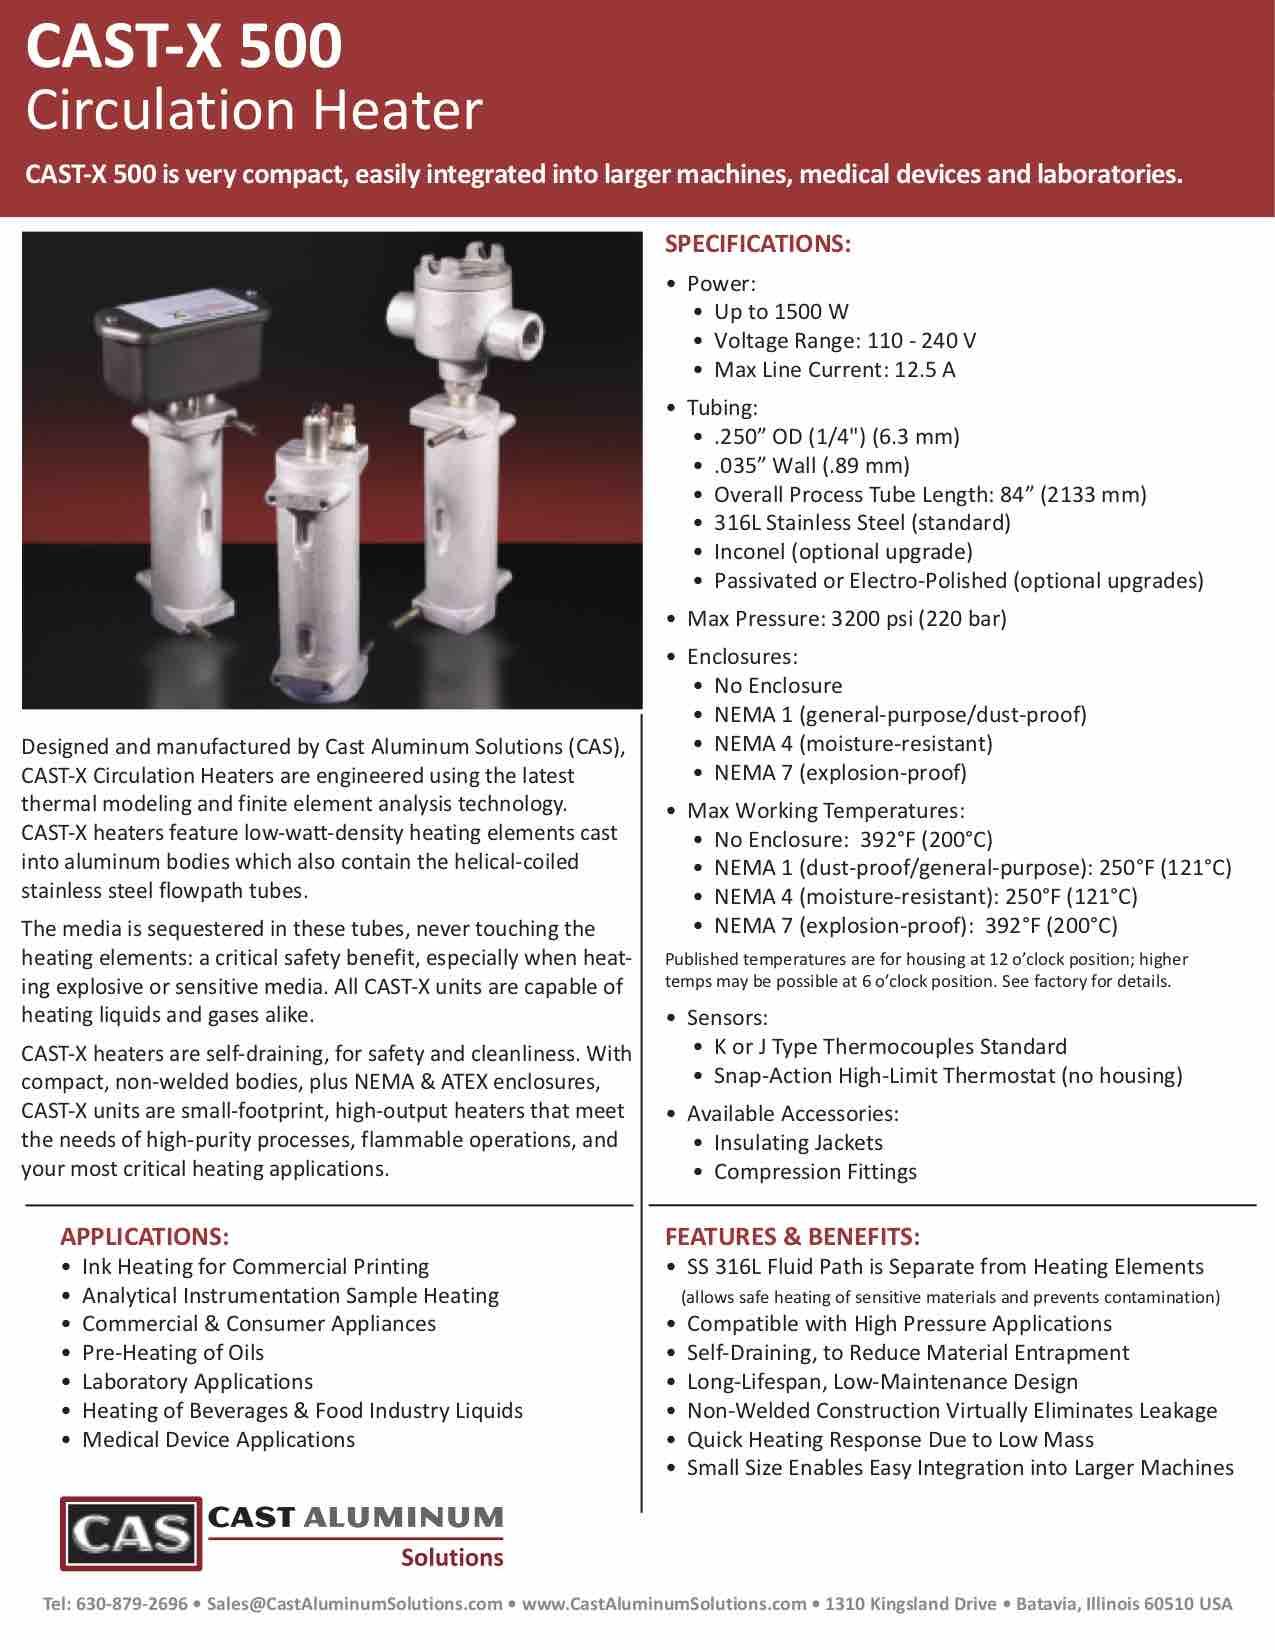 CAST X 500 Circulation Heater Cast Aluminum Solutions (dragged)